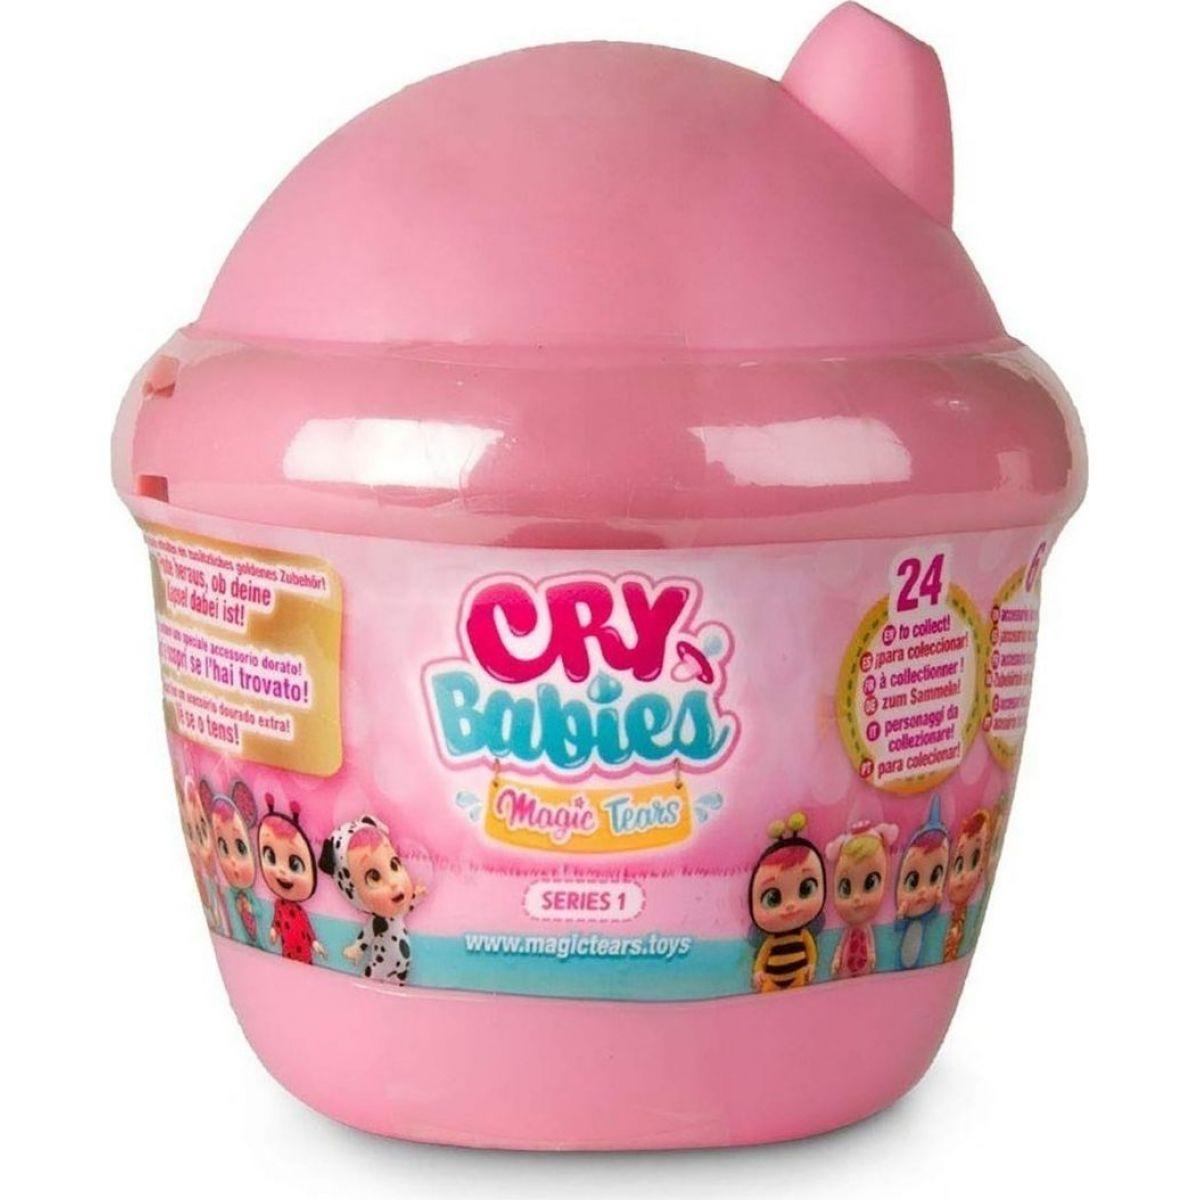 Cry Babies magické slzy série 3 svetloružová